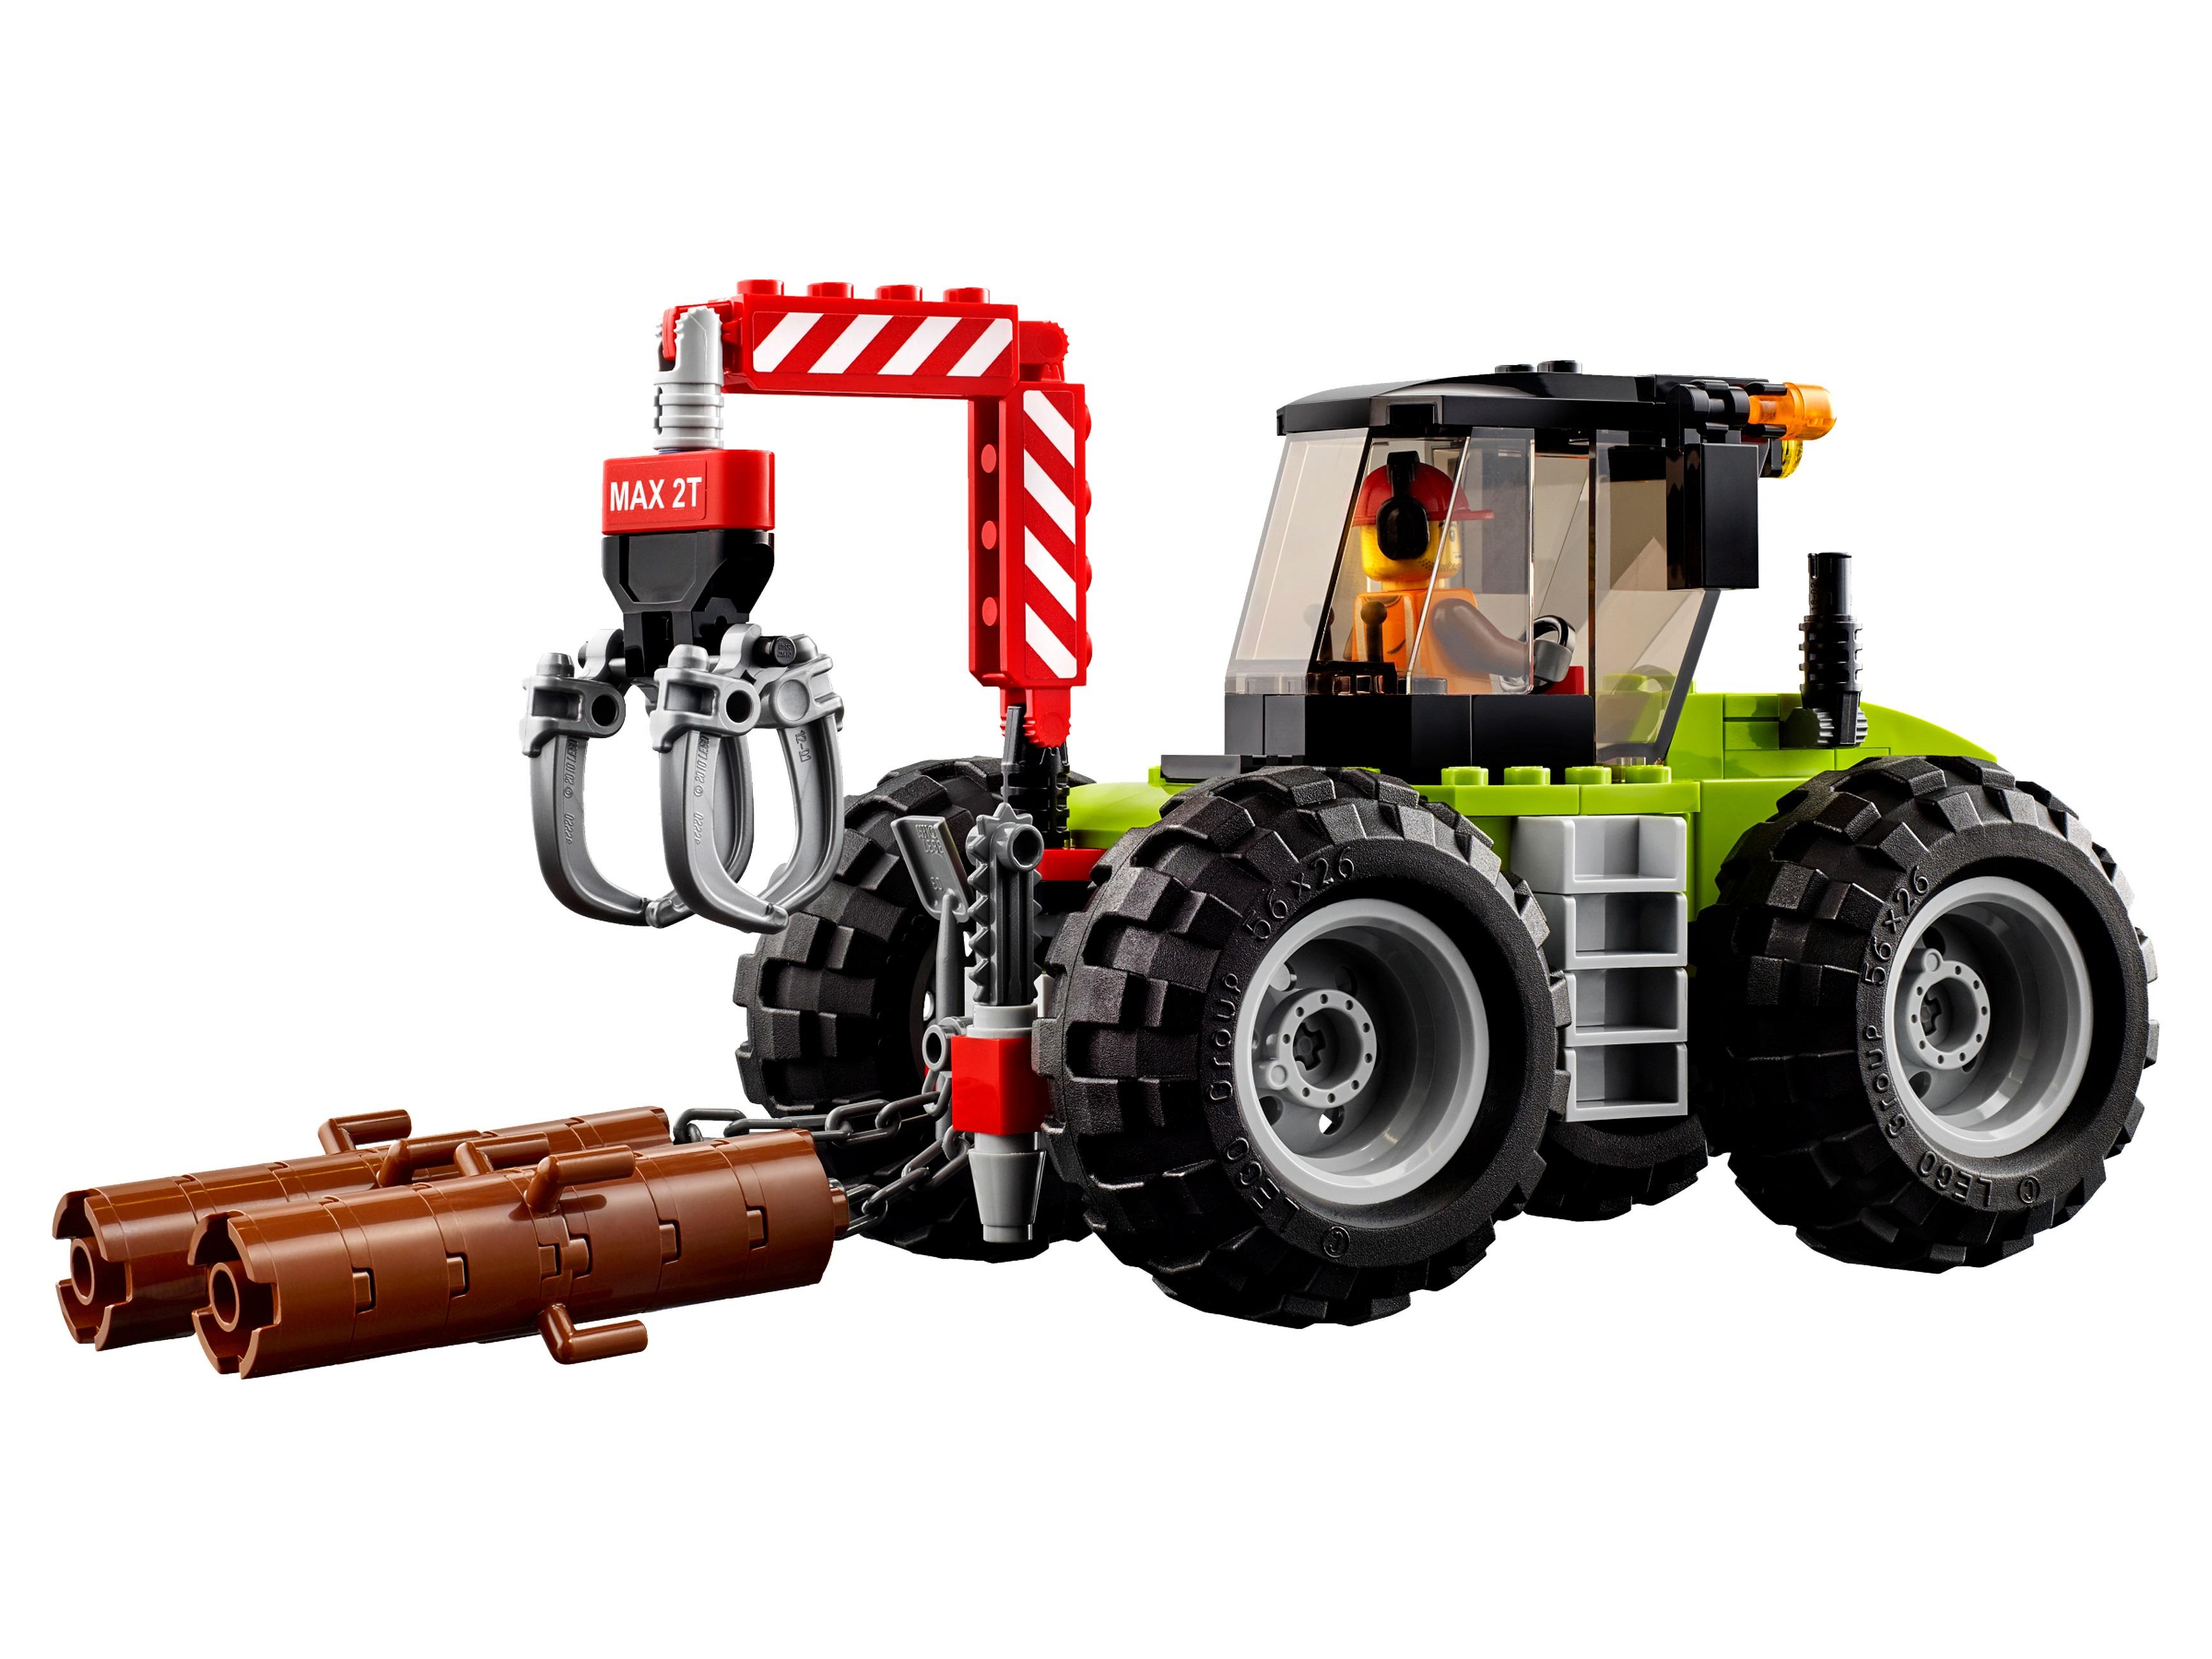 набор лего трактора интересно